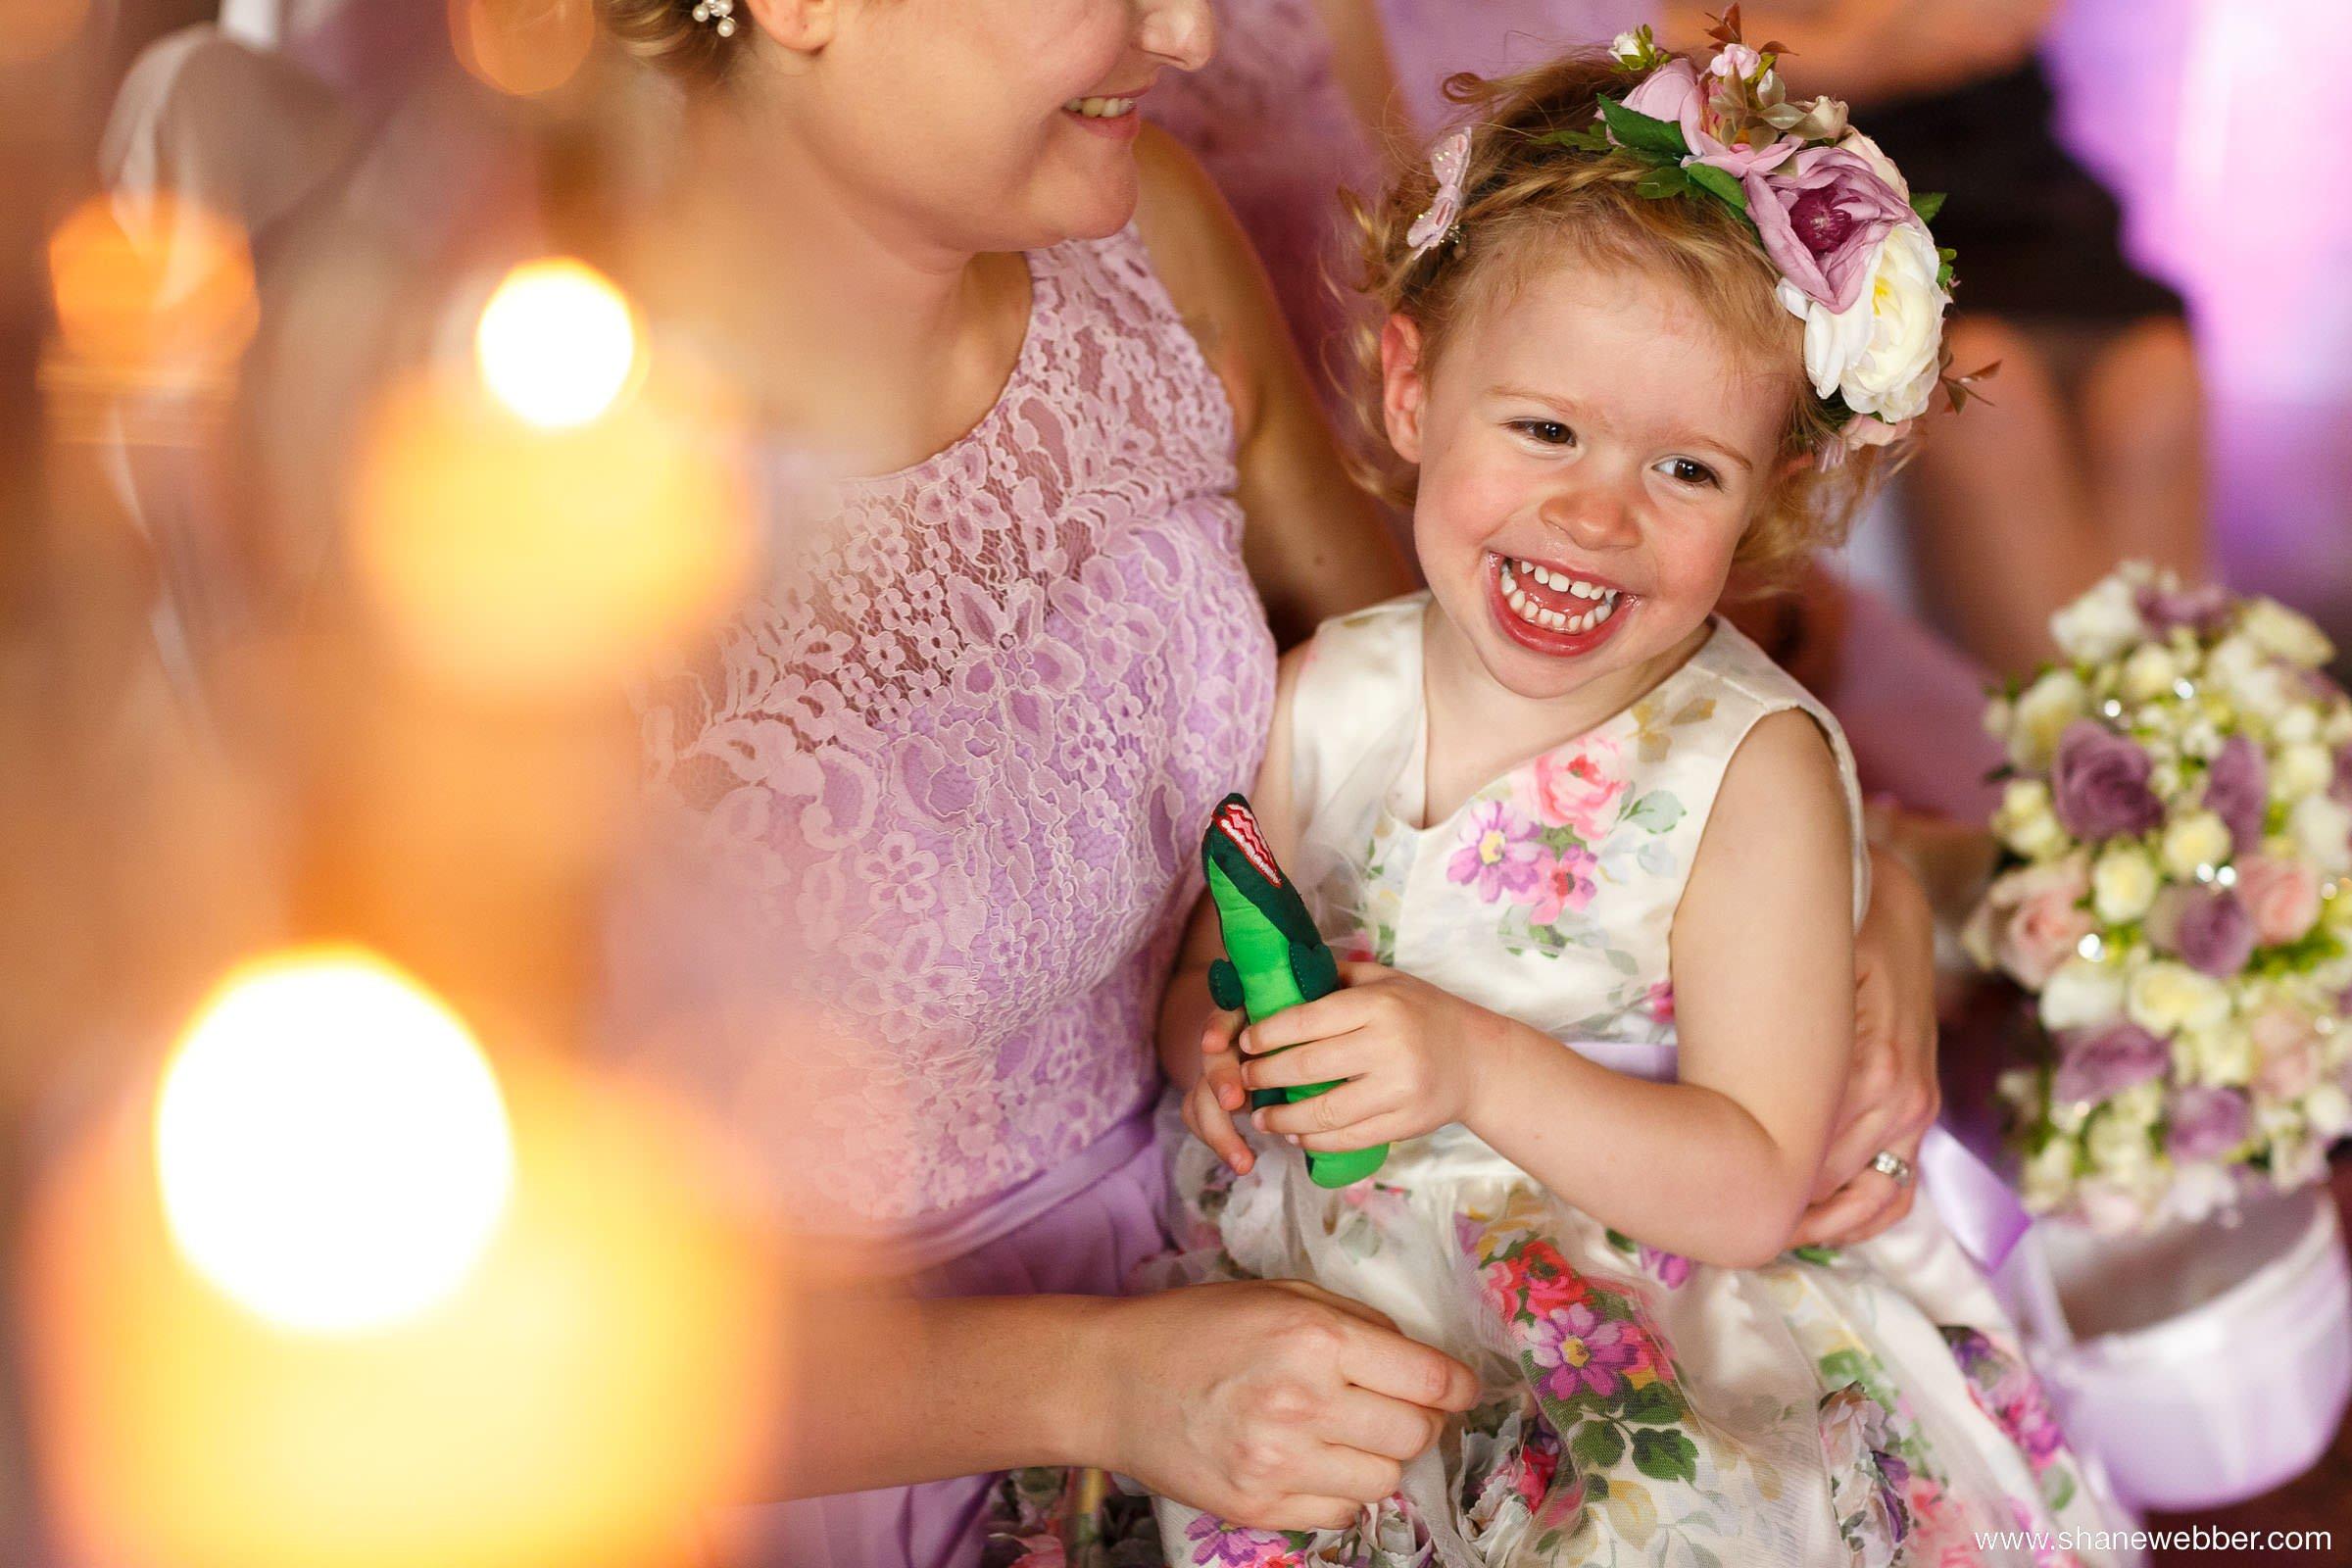 Best Manchester Wedding Photographer 2016